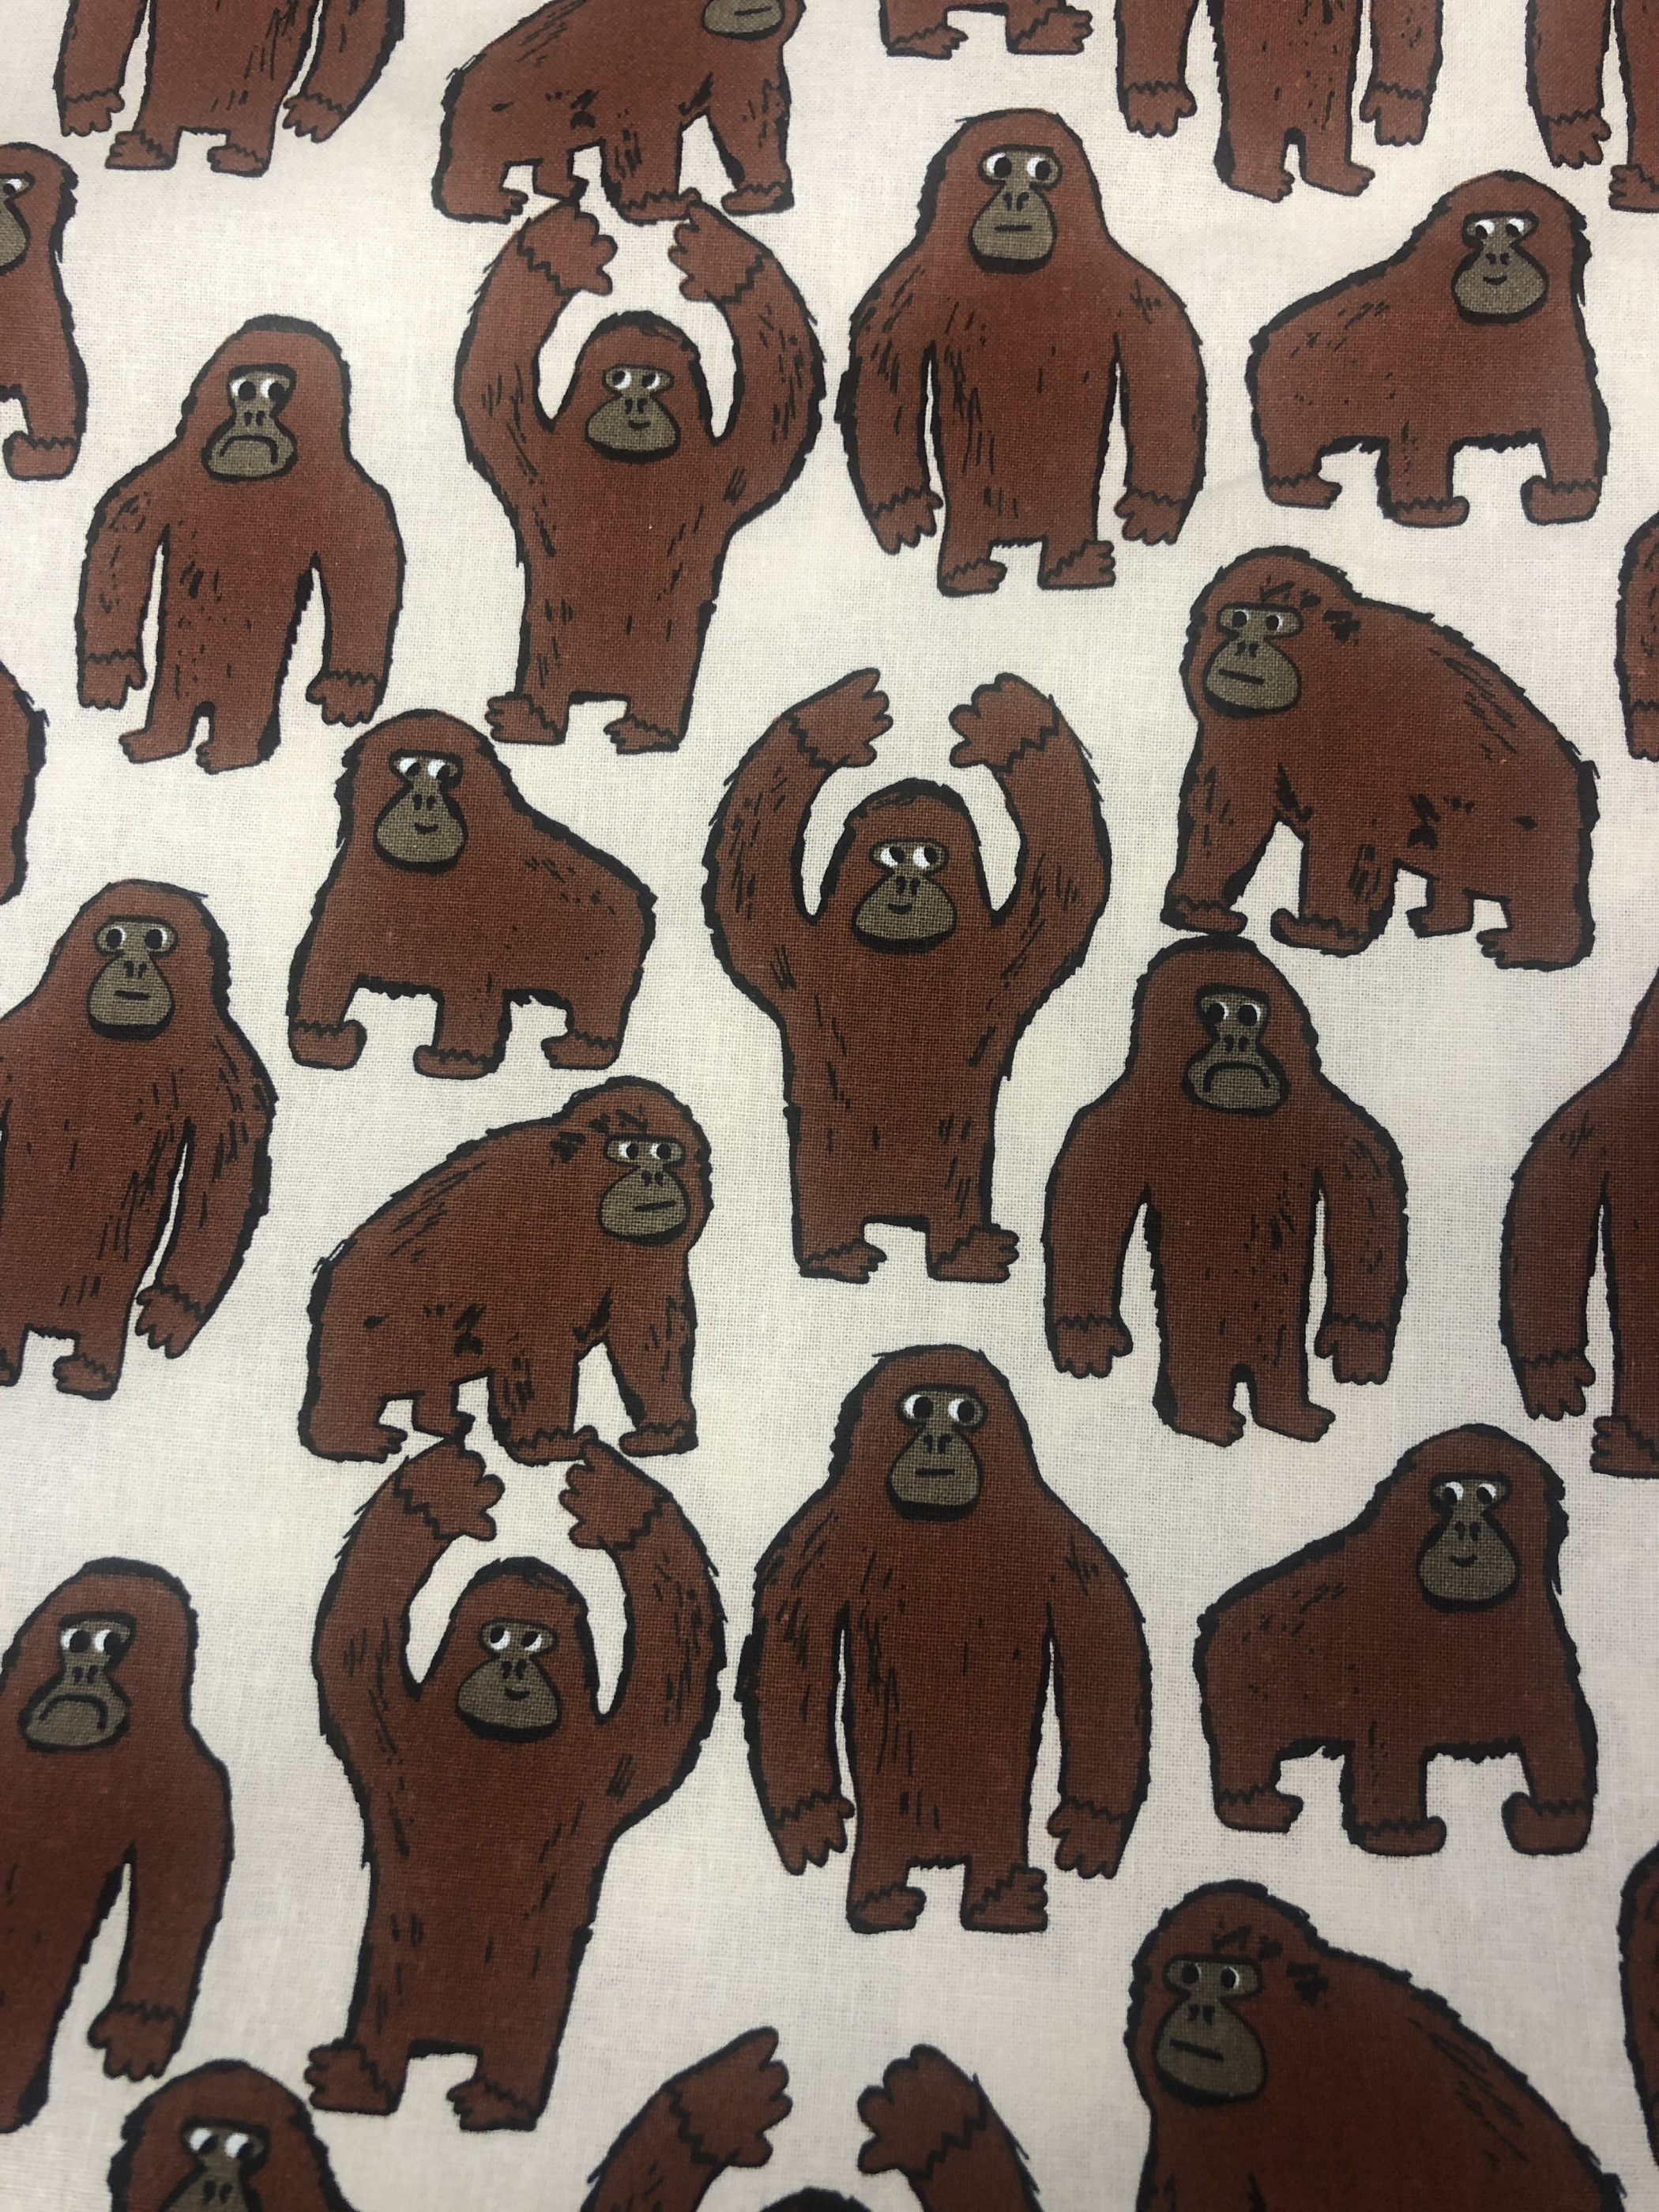 apor bomullstyg metervara brun beige barntyg djur tyglust laholm